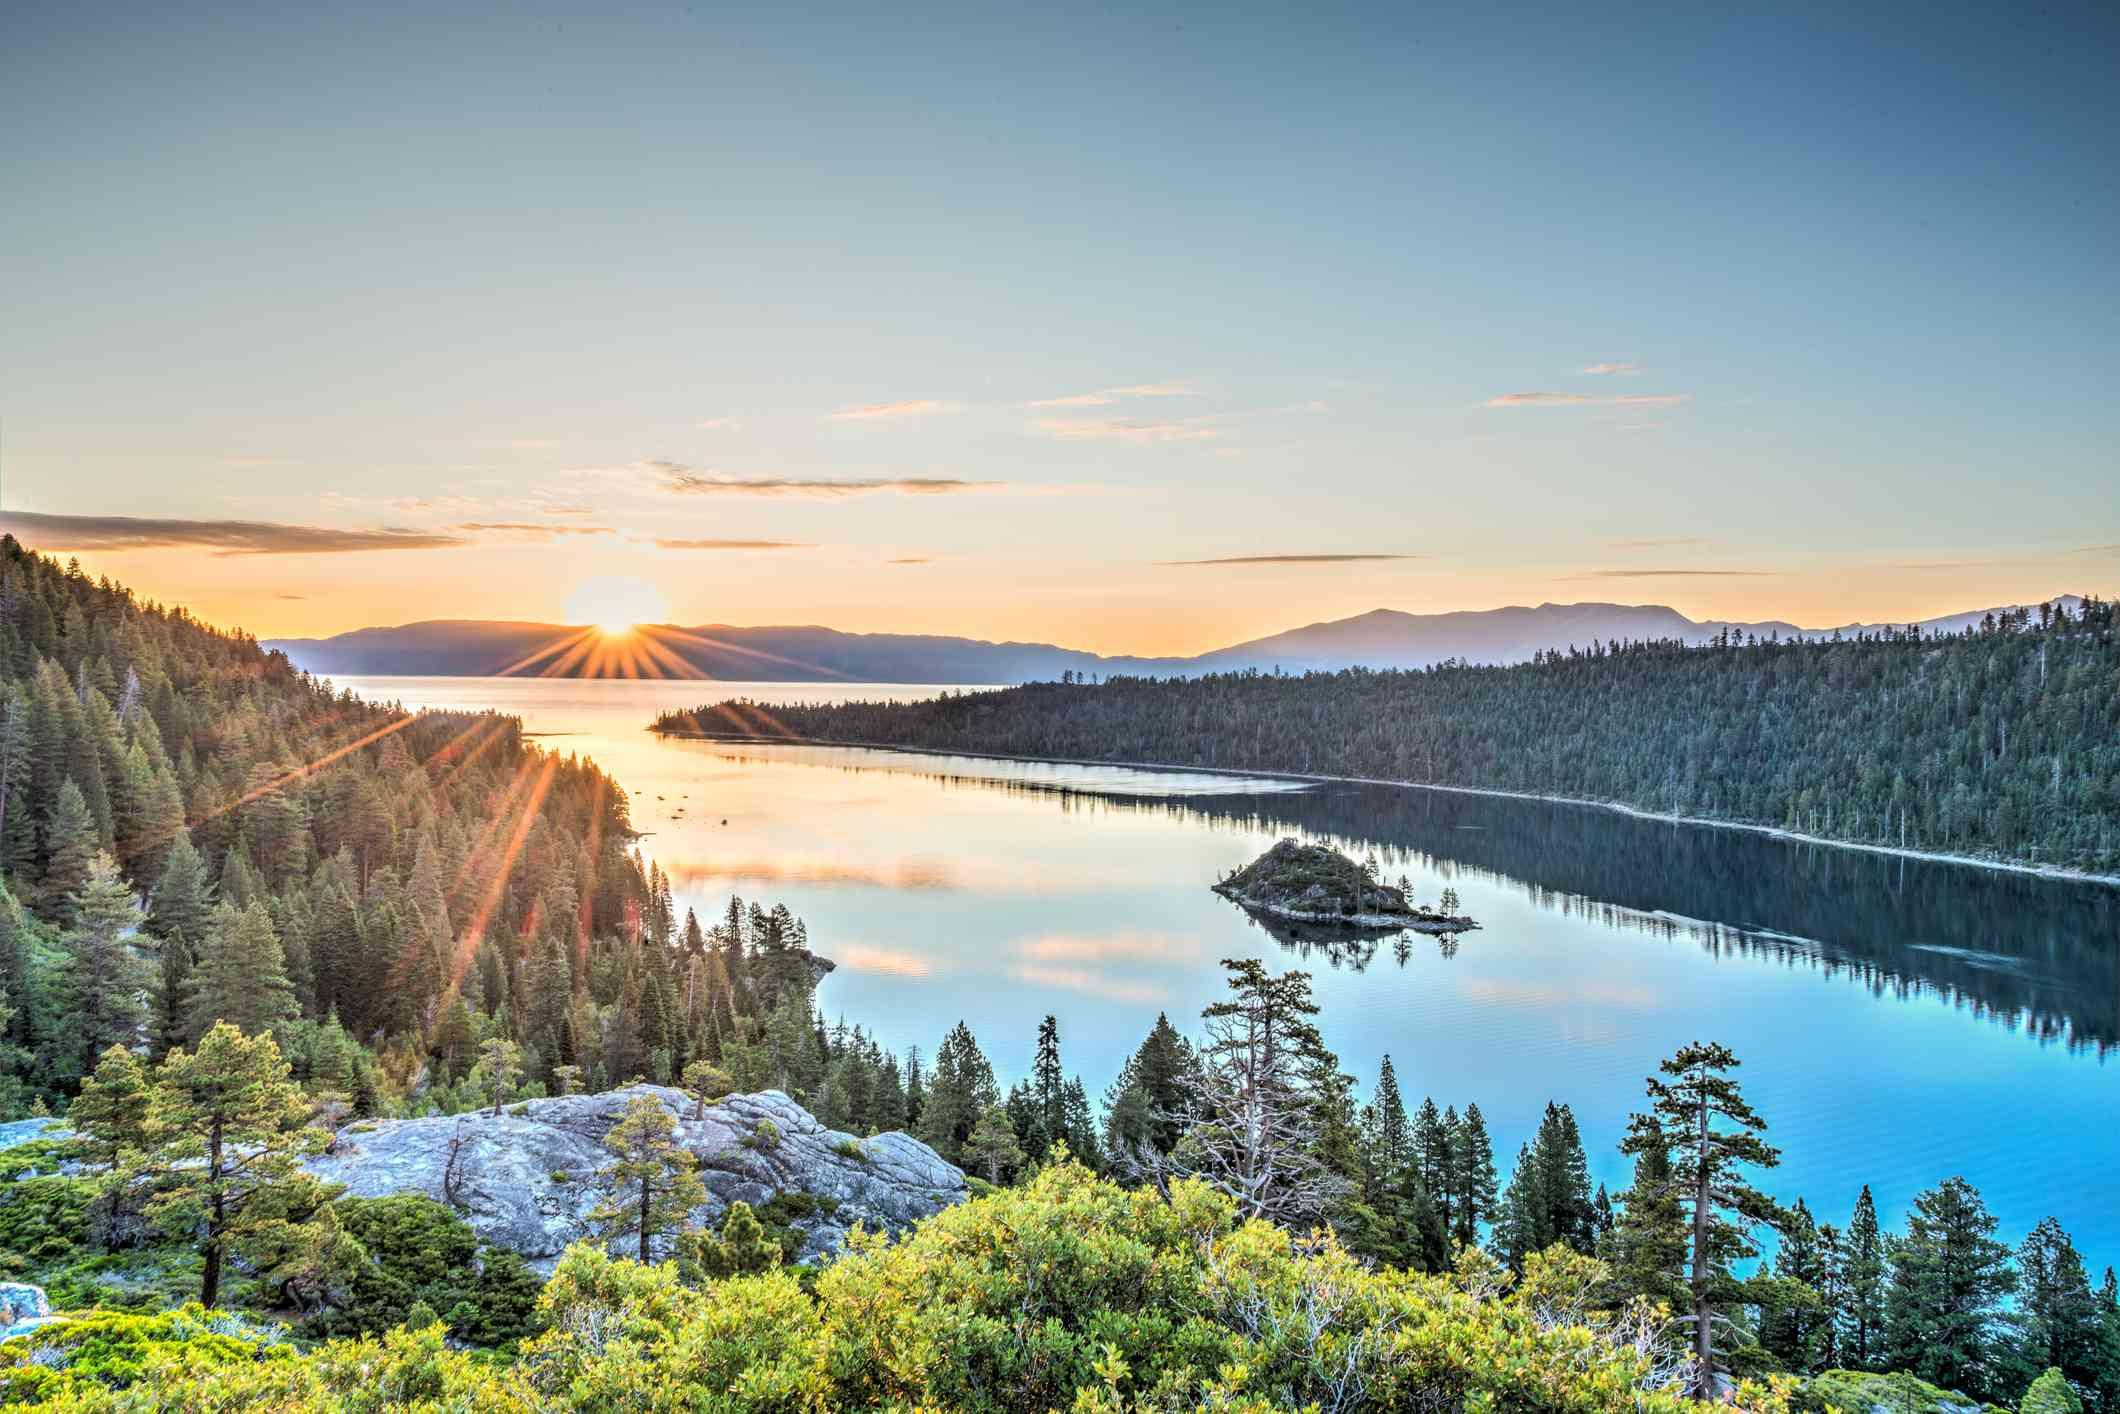 Sunrise over Lake Tahoe Emerald Bay